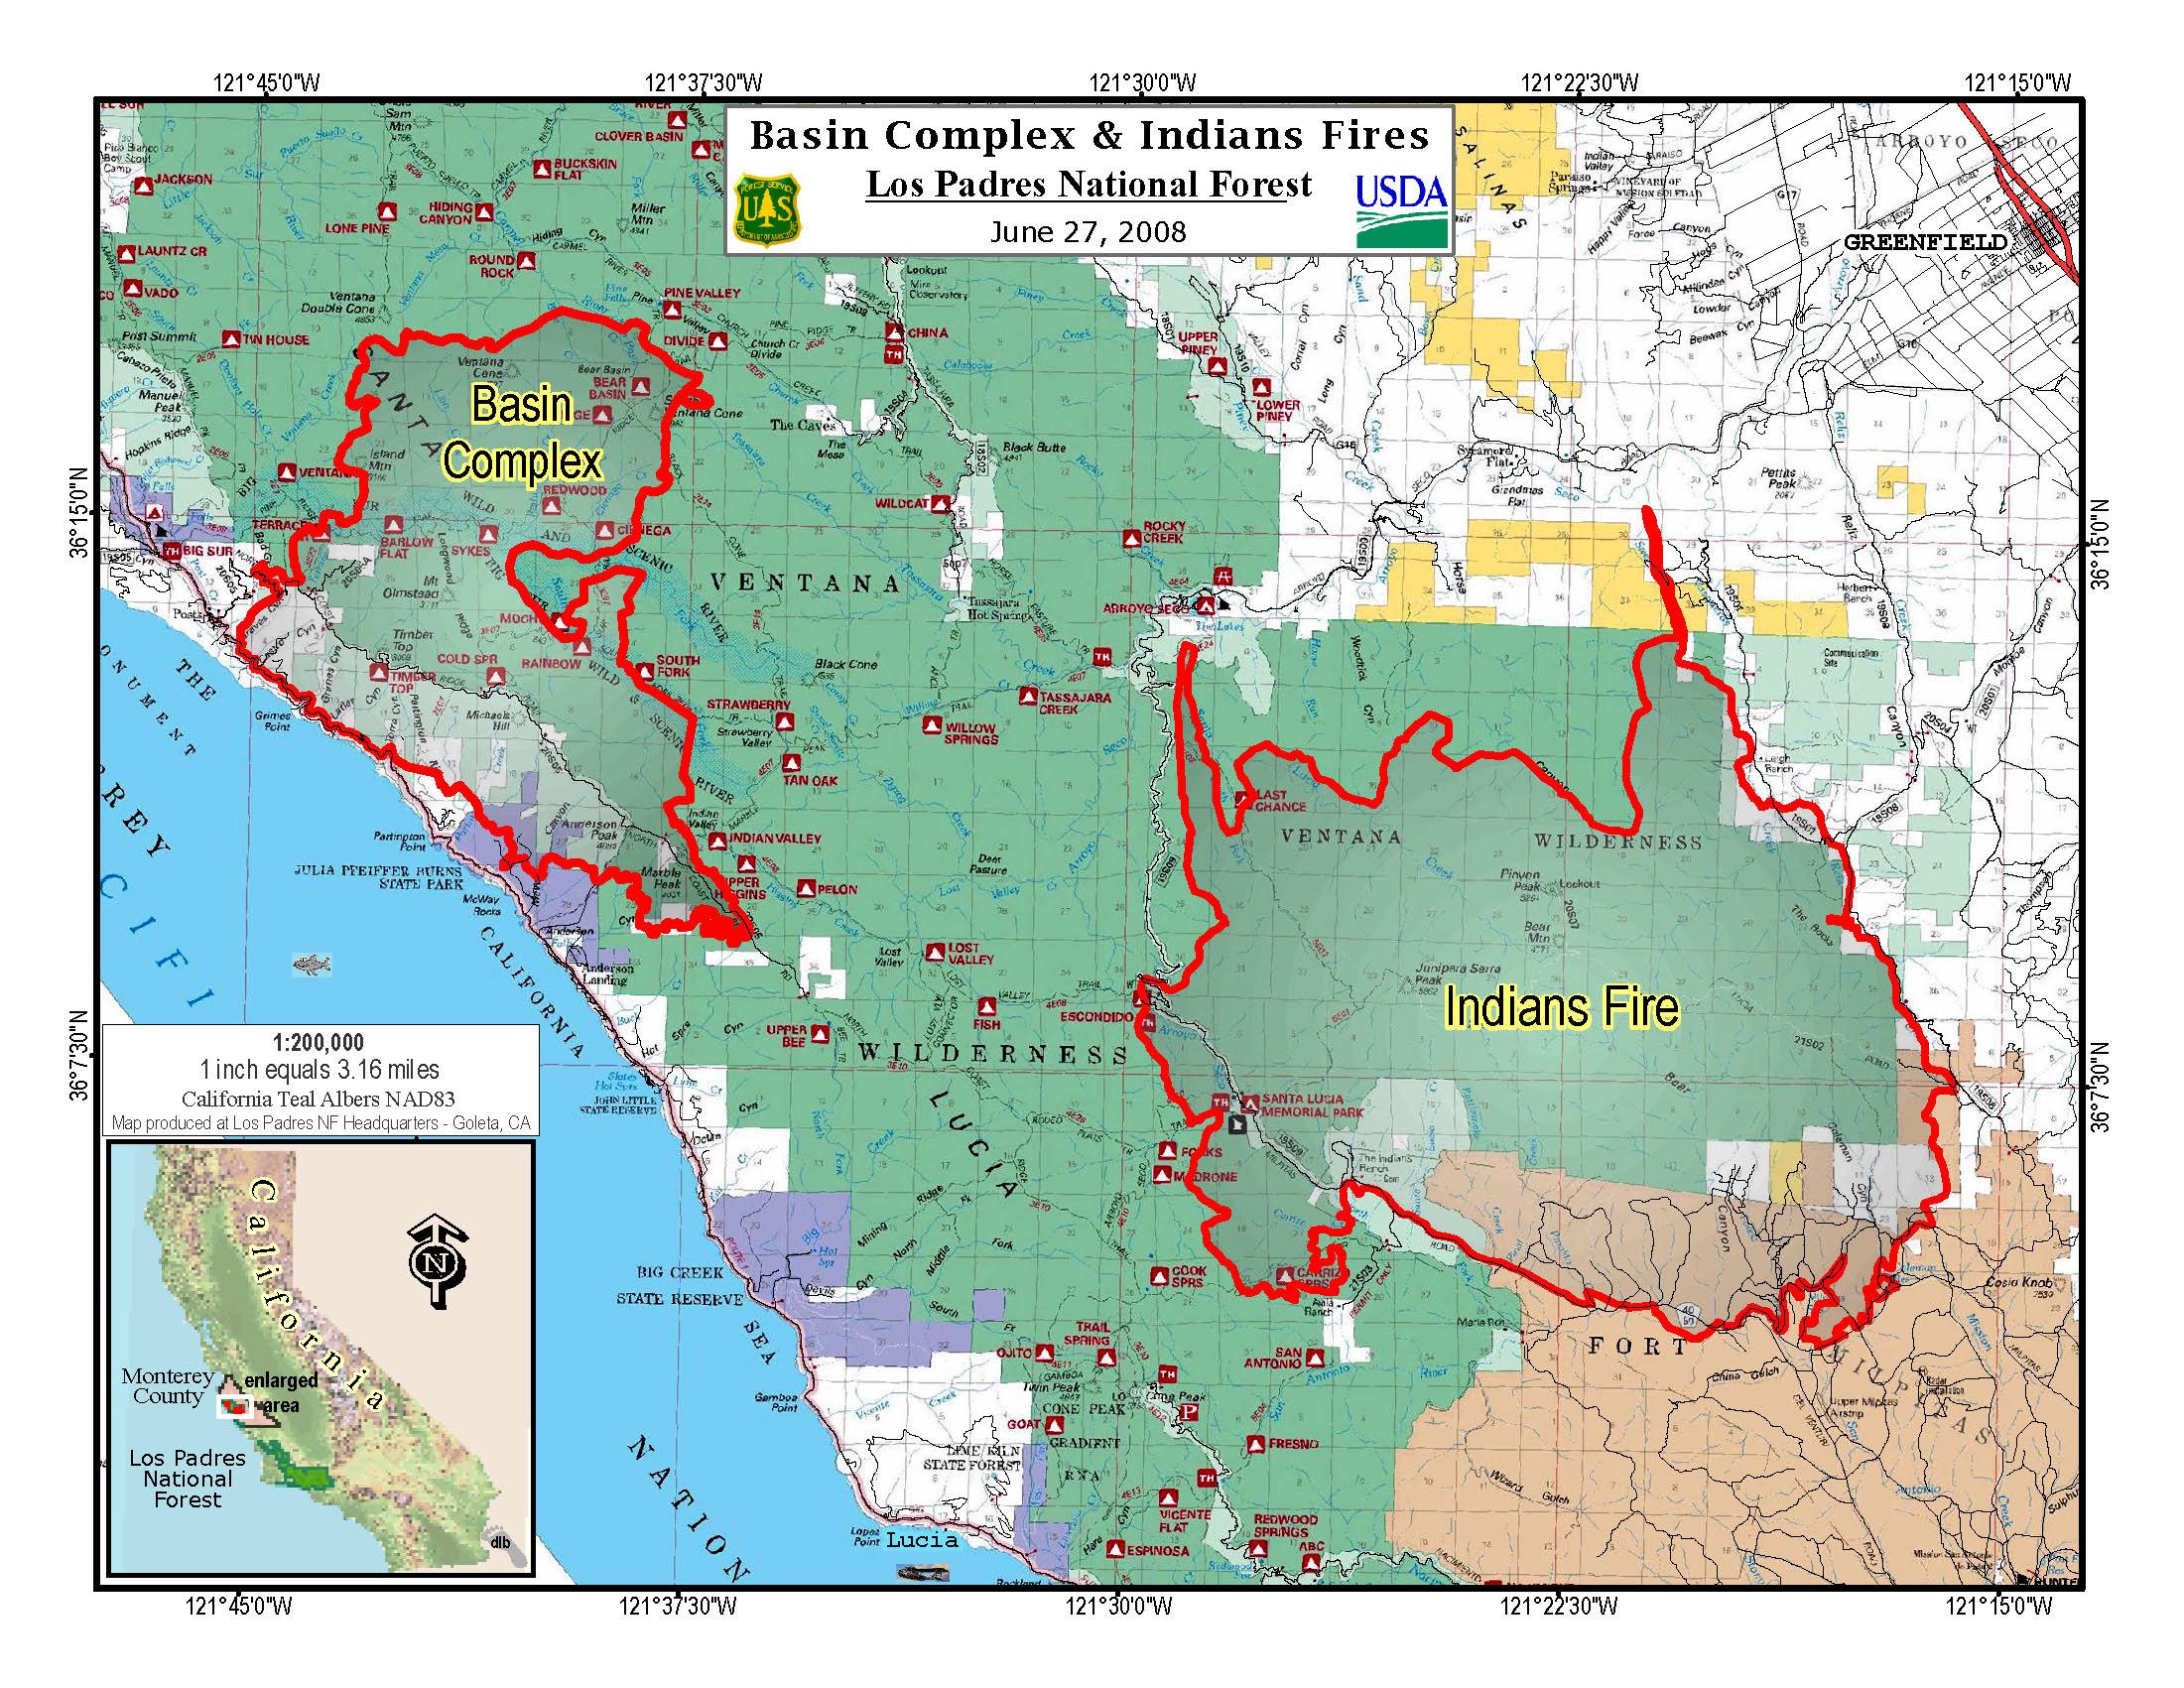 California Fires Update Map - Klipy - California Fires Update Map